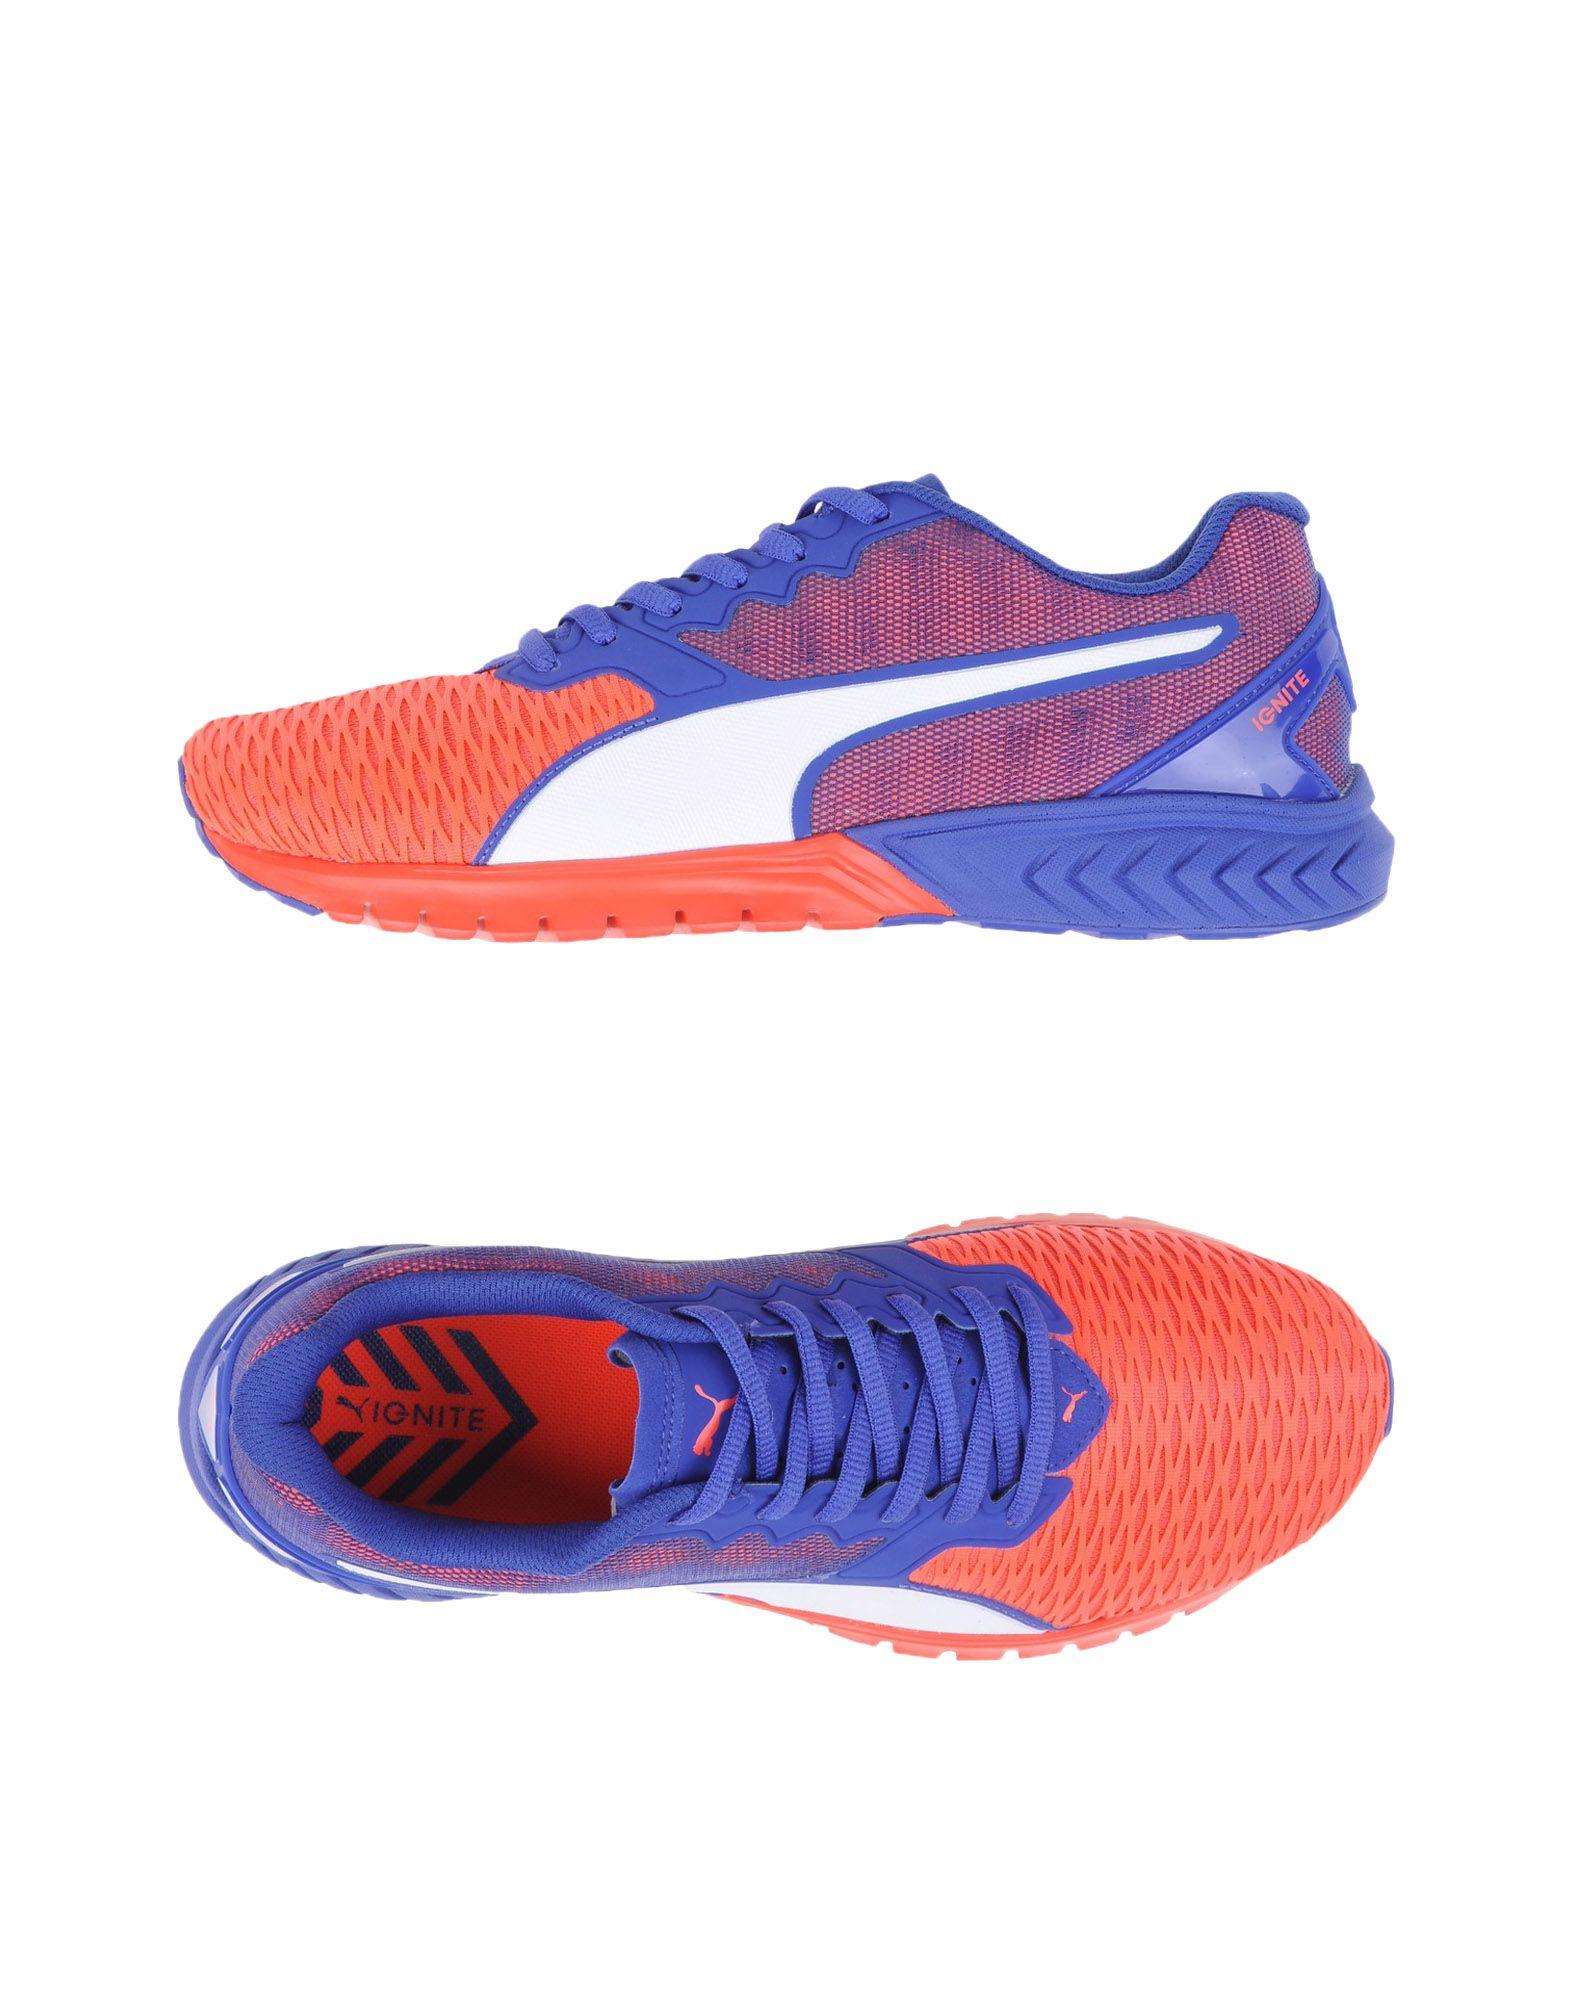 Sneakers Puma Ignite Dual Wns - Femme - Sneakers Puma sur